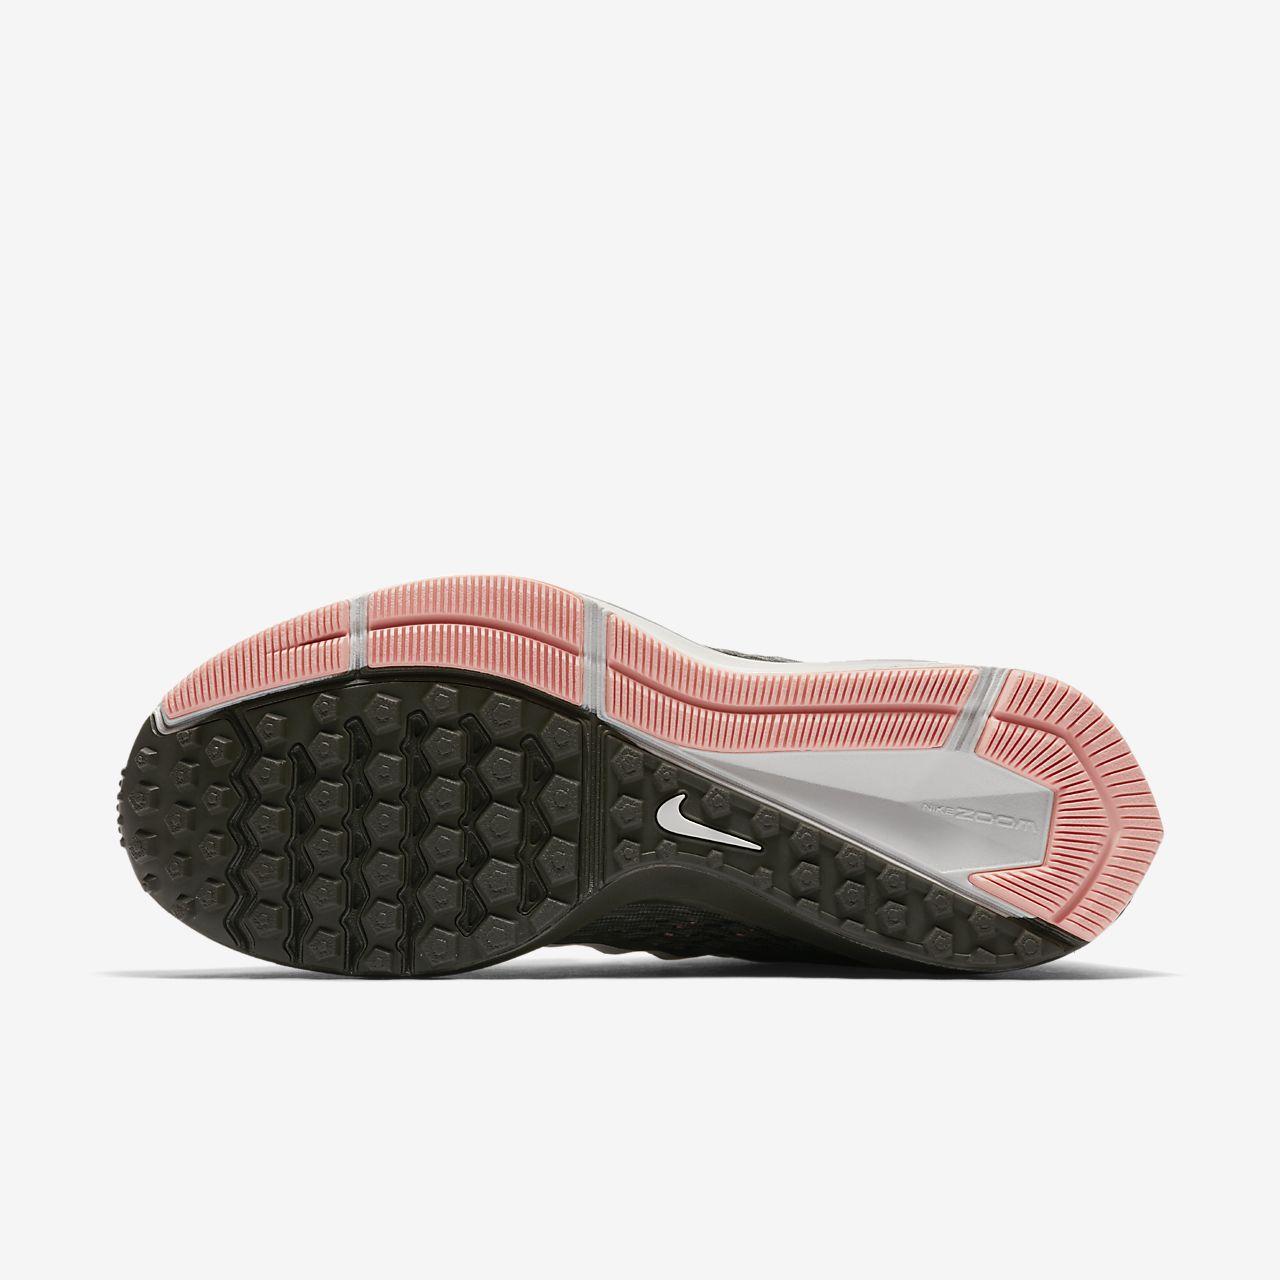 ea6107eae09 Nike Air Zoom Winflo 5 Women's Running Shoe